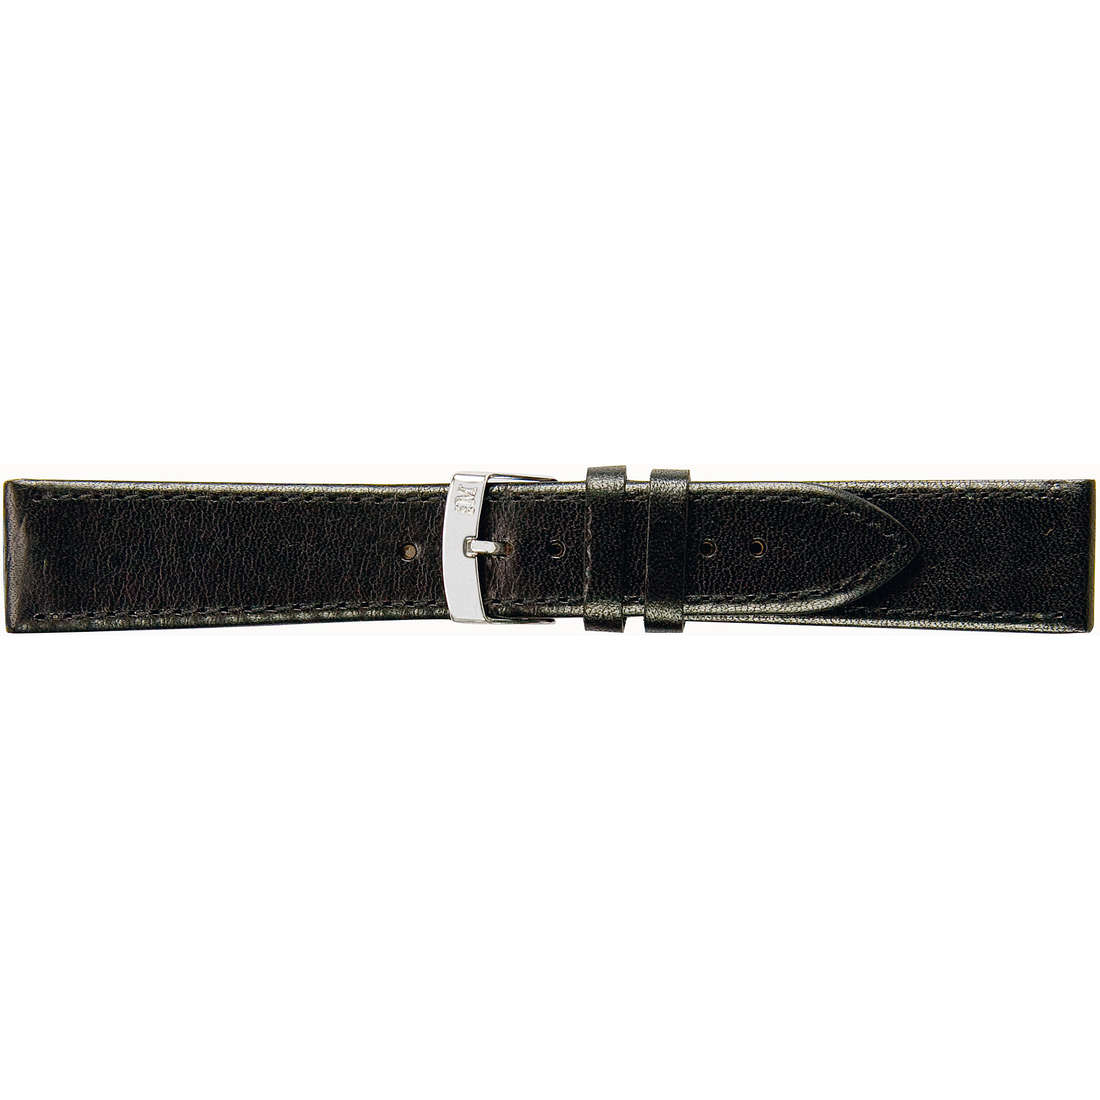 watch watch bands watch straps man Morellato Performance A01X3425695019CR16